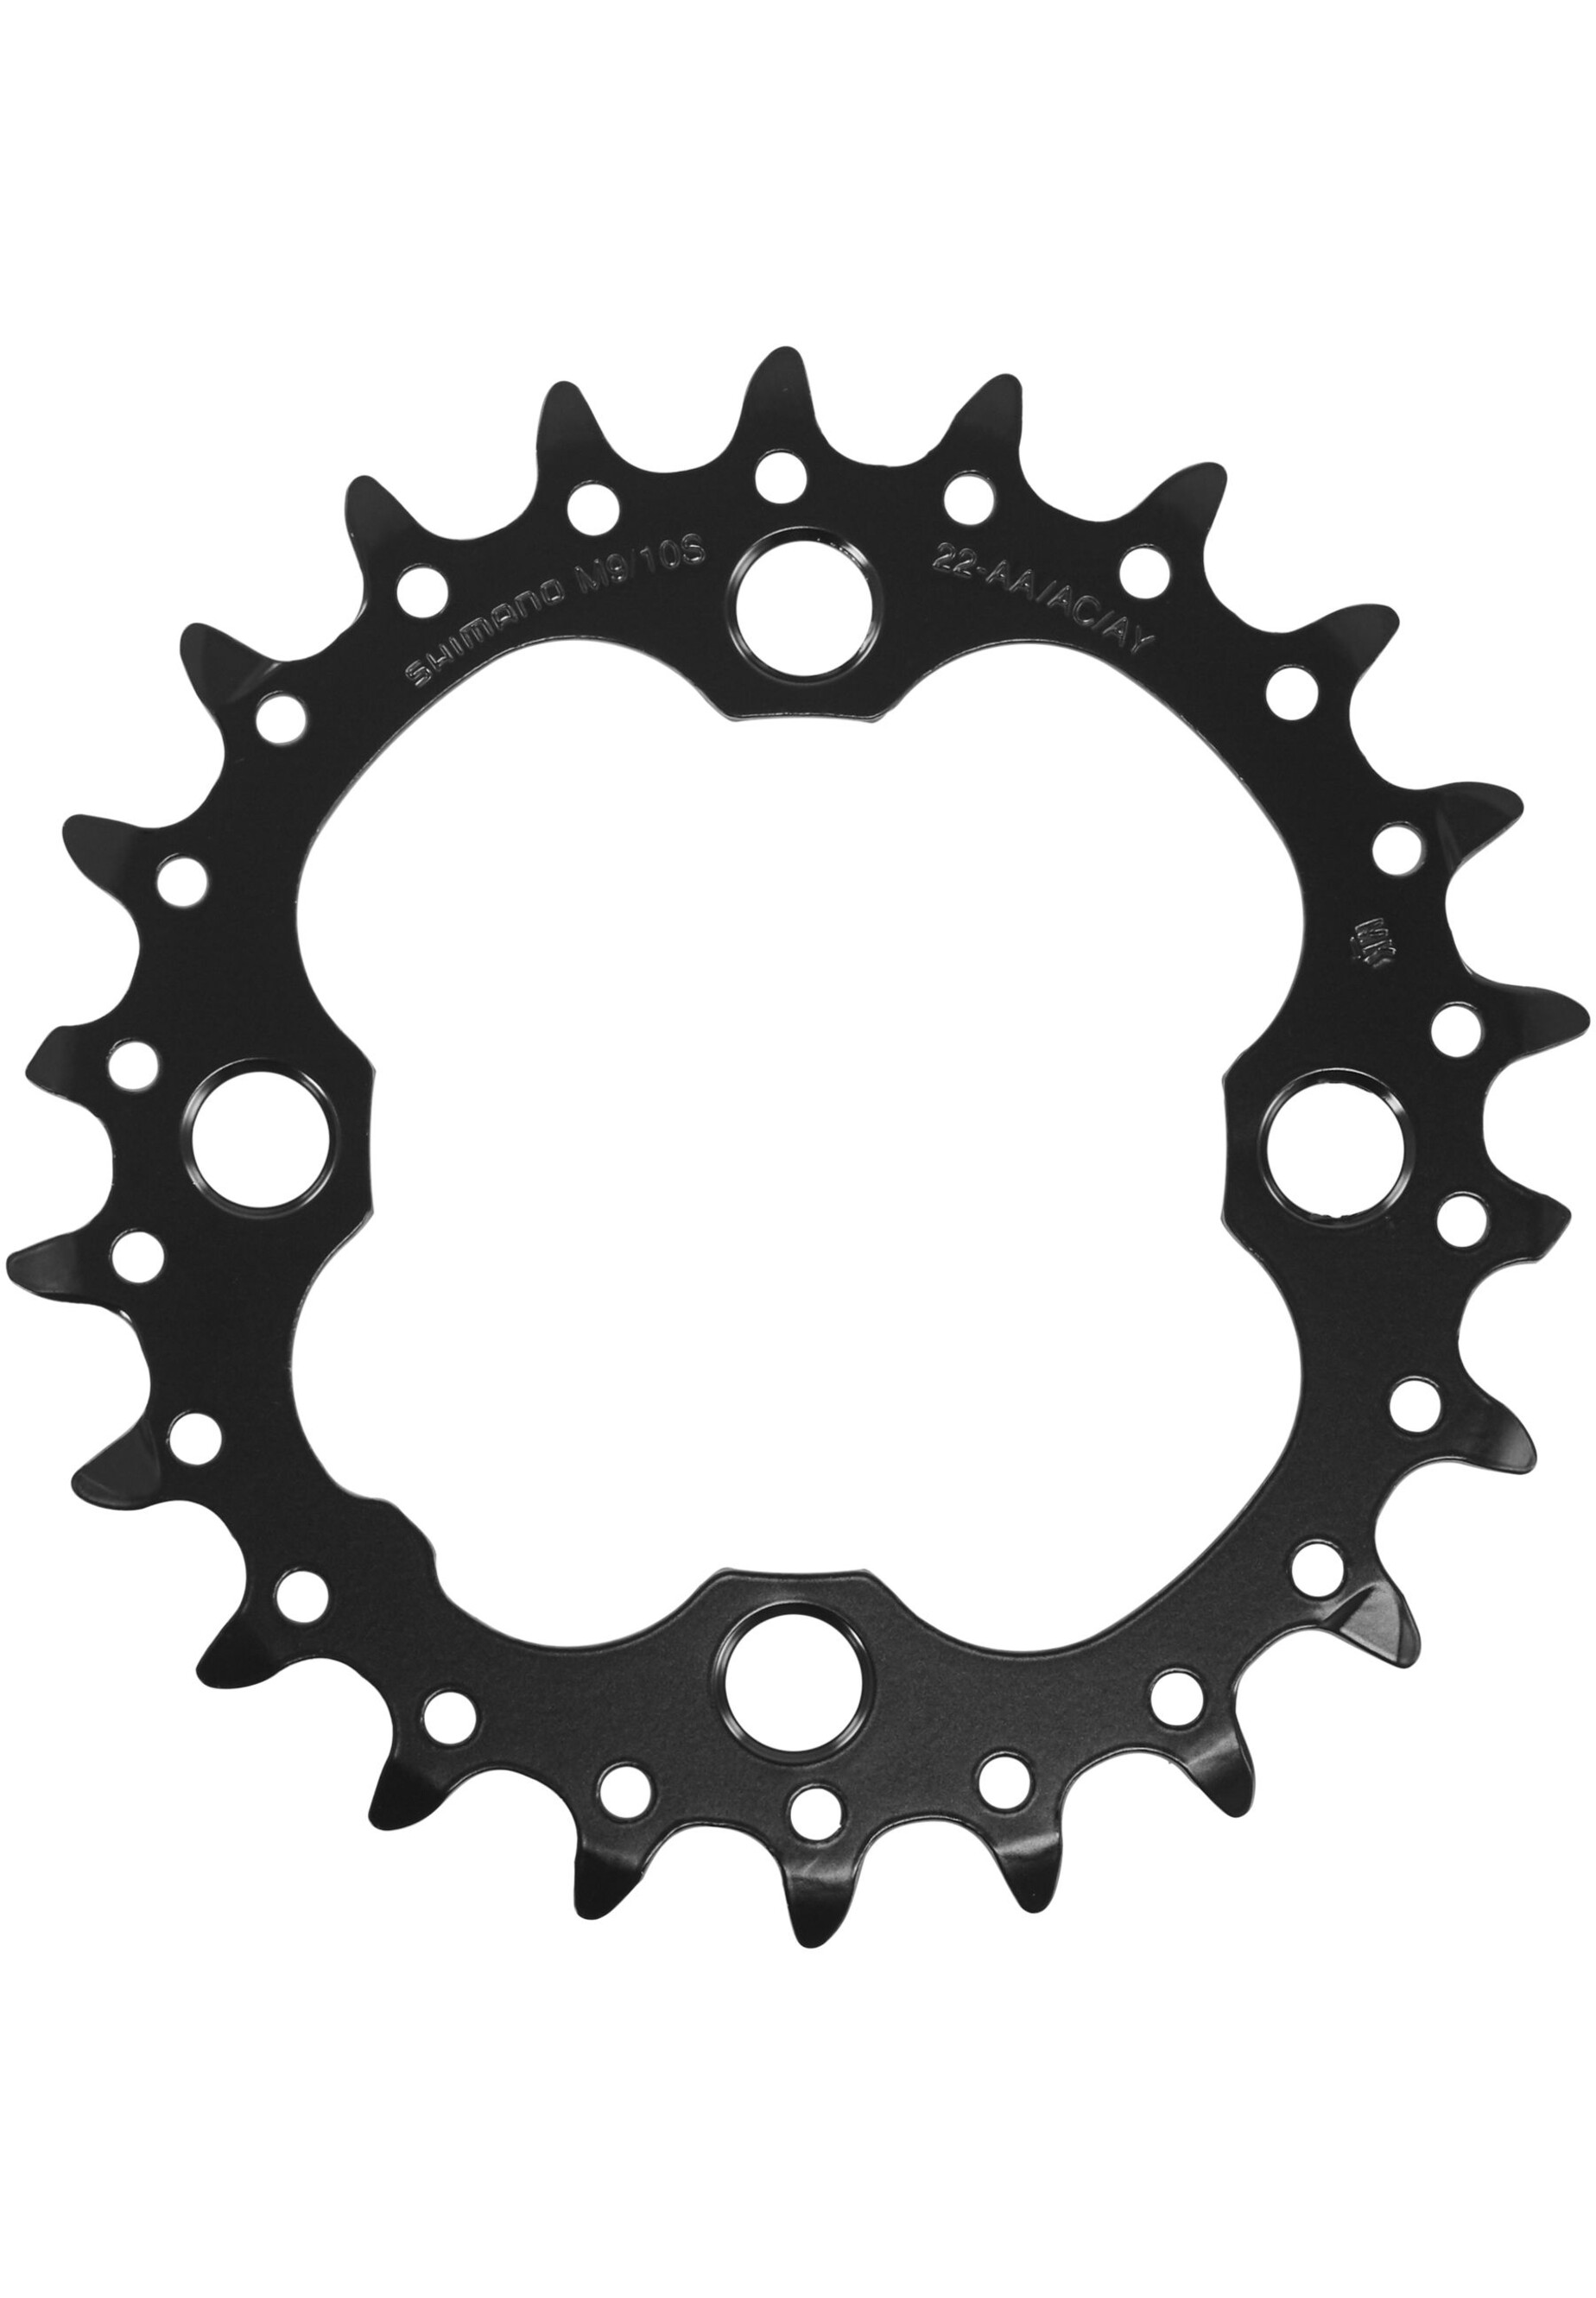 10274219f66 Shimano SLX FC-M660 Chainring black at Bikester.co.uk